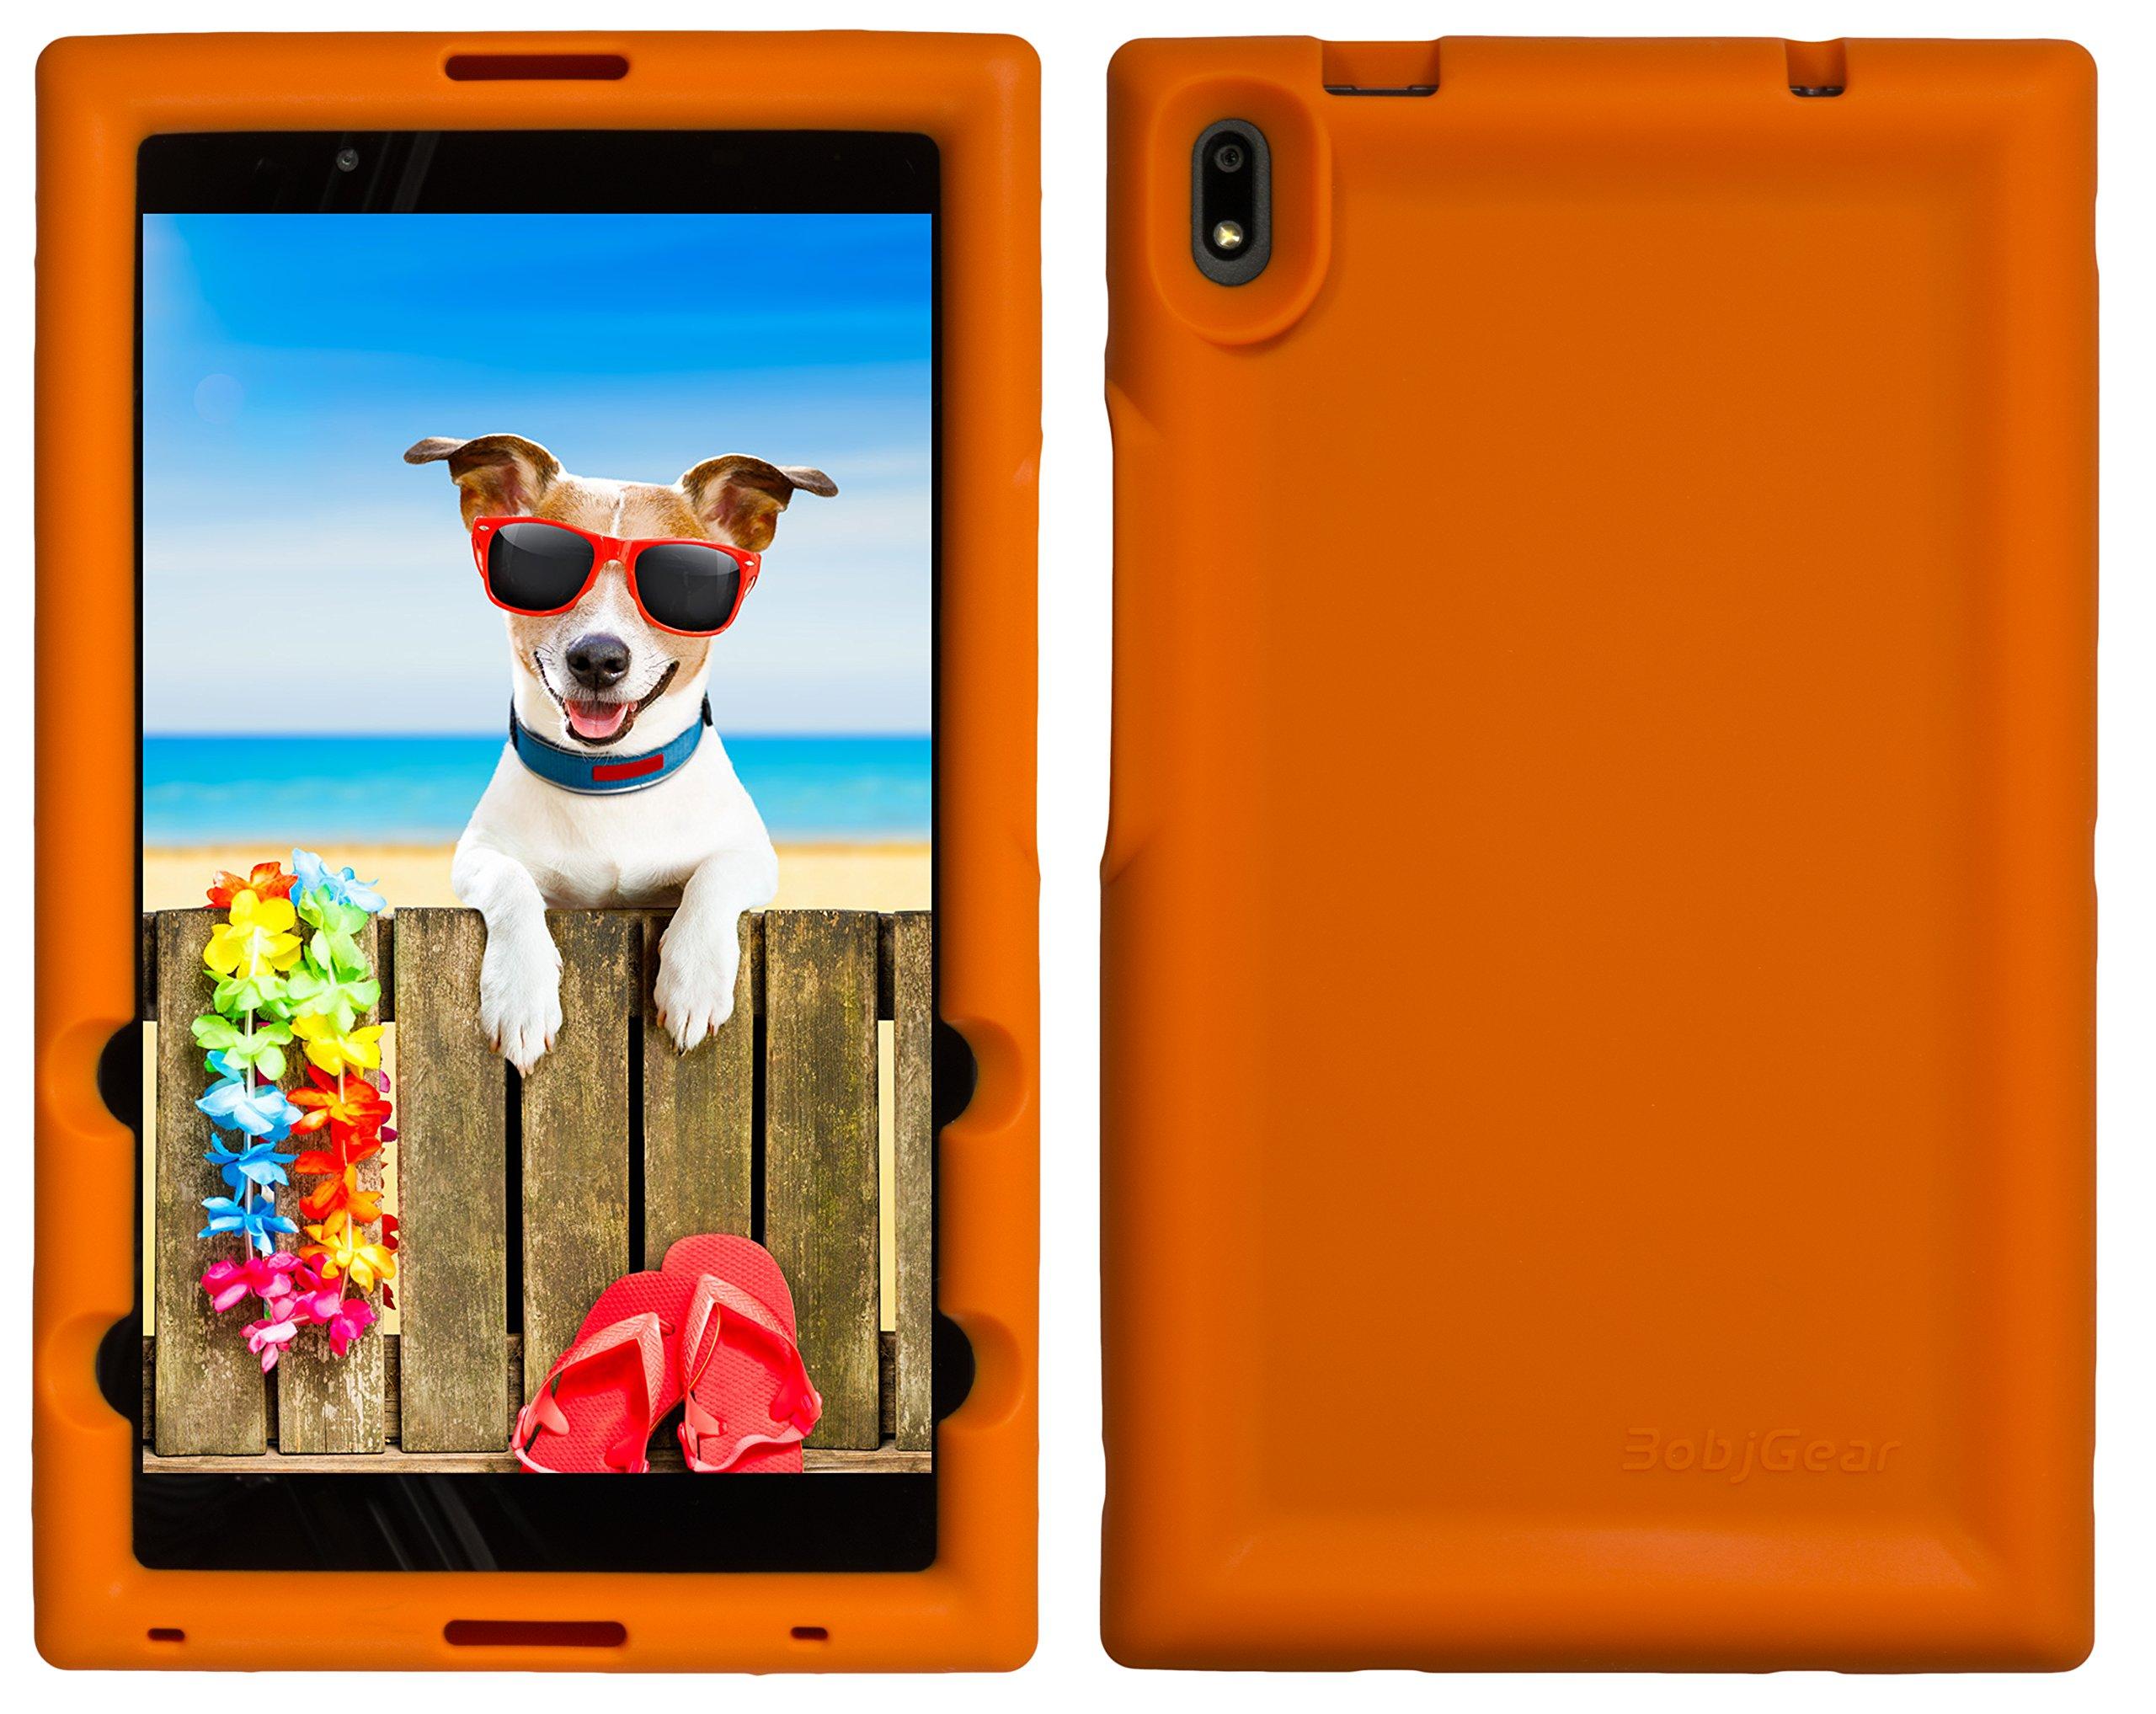 BobjGear Bobj Rugged Tablet Case for Lenovo Tab 4 8 Plus (TB-8704V, TB-8704XF, TB-8704X, TB-8704A) - BobjBounces Kid Friendly (Outrageous Orange)